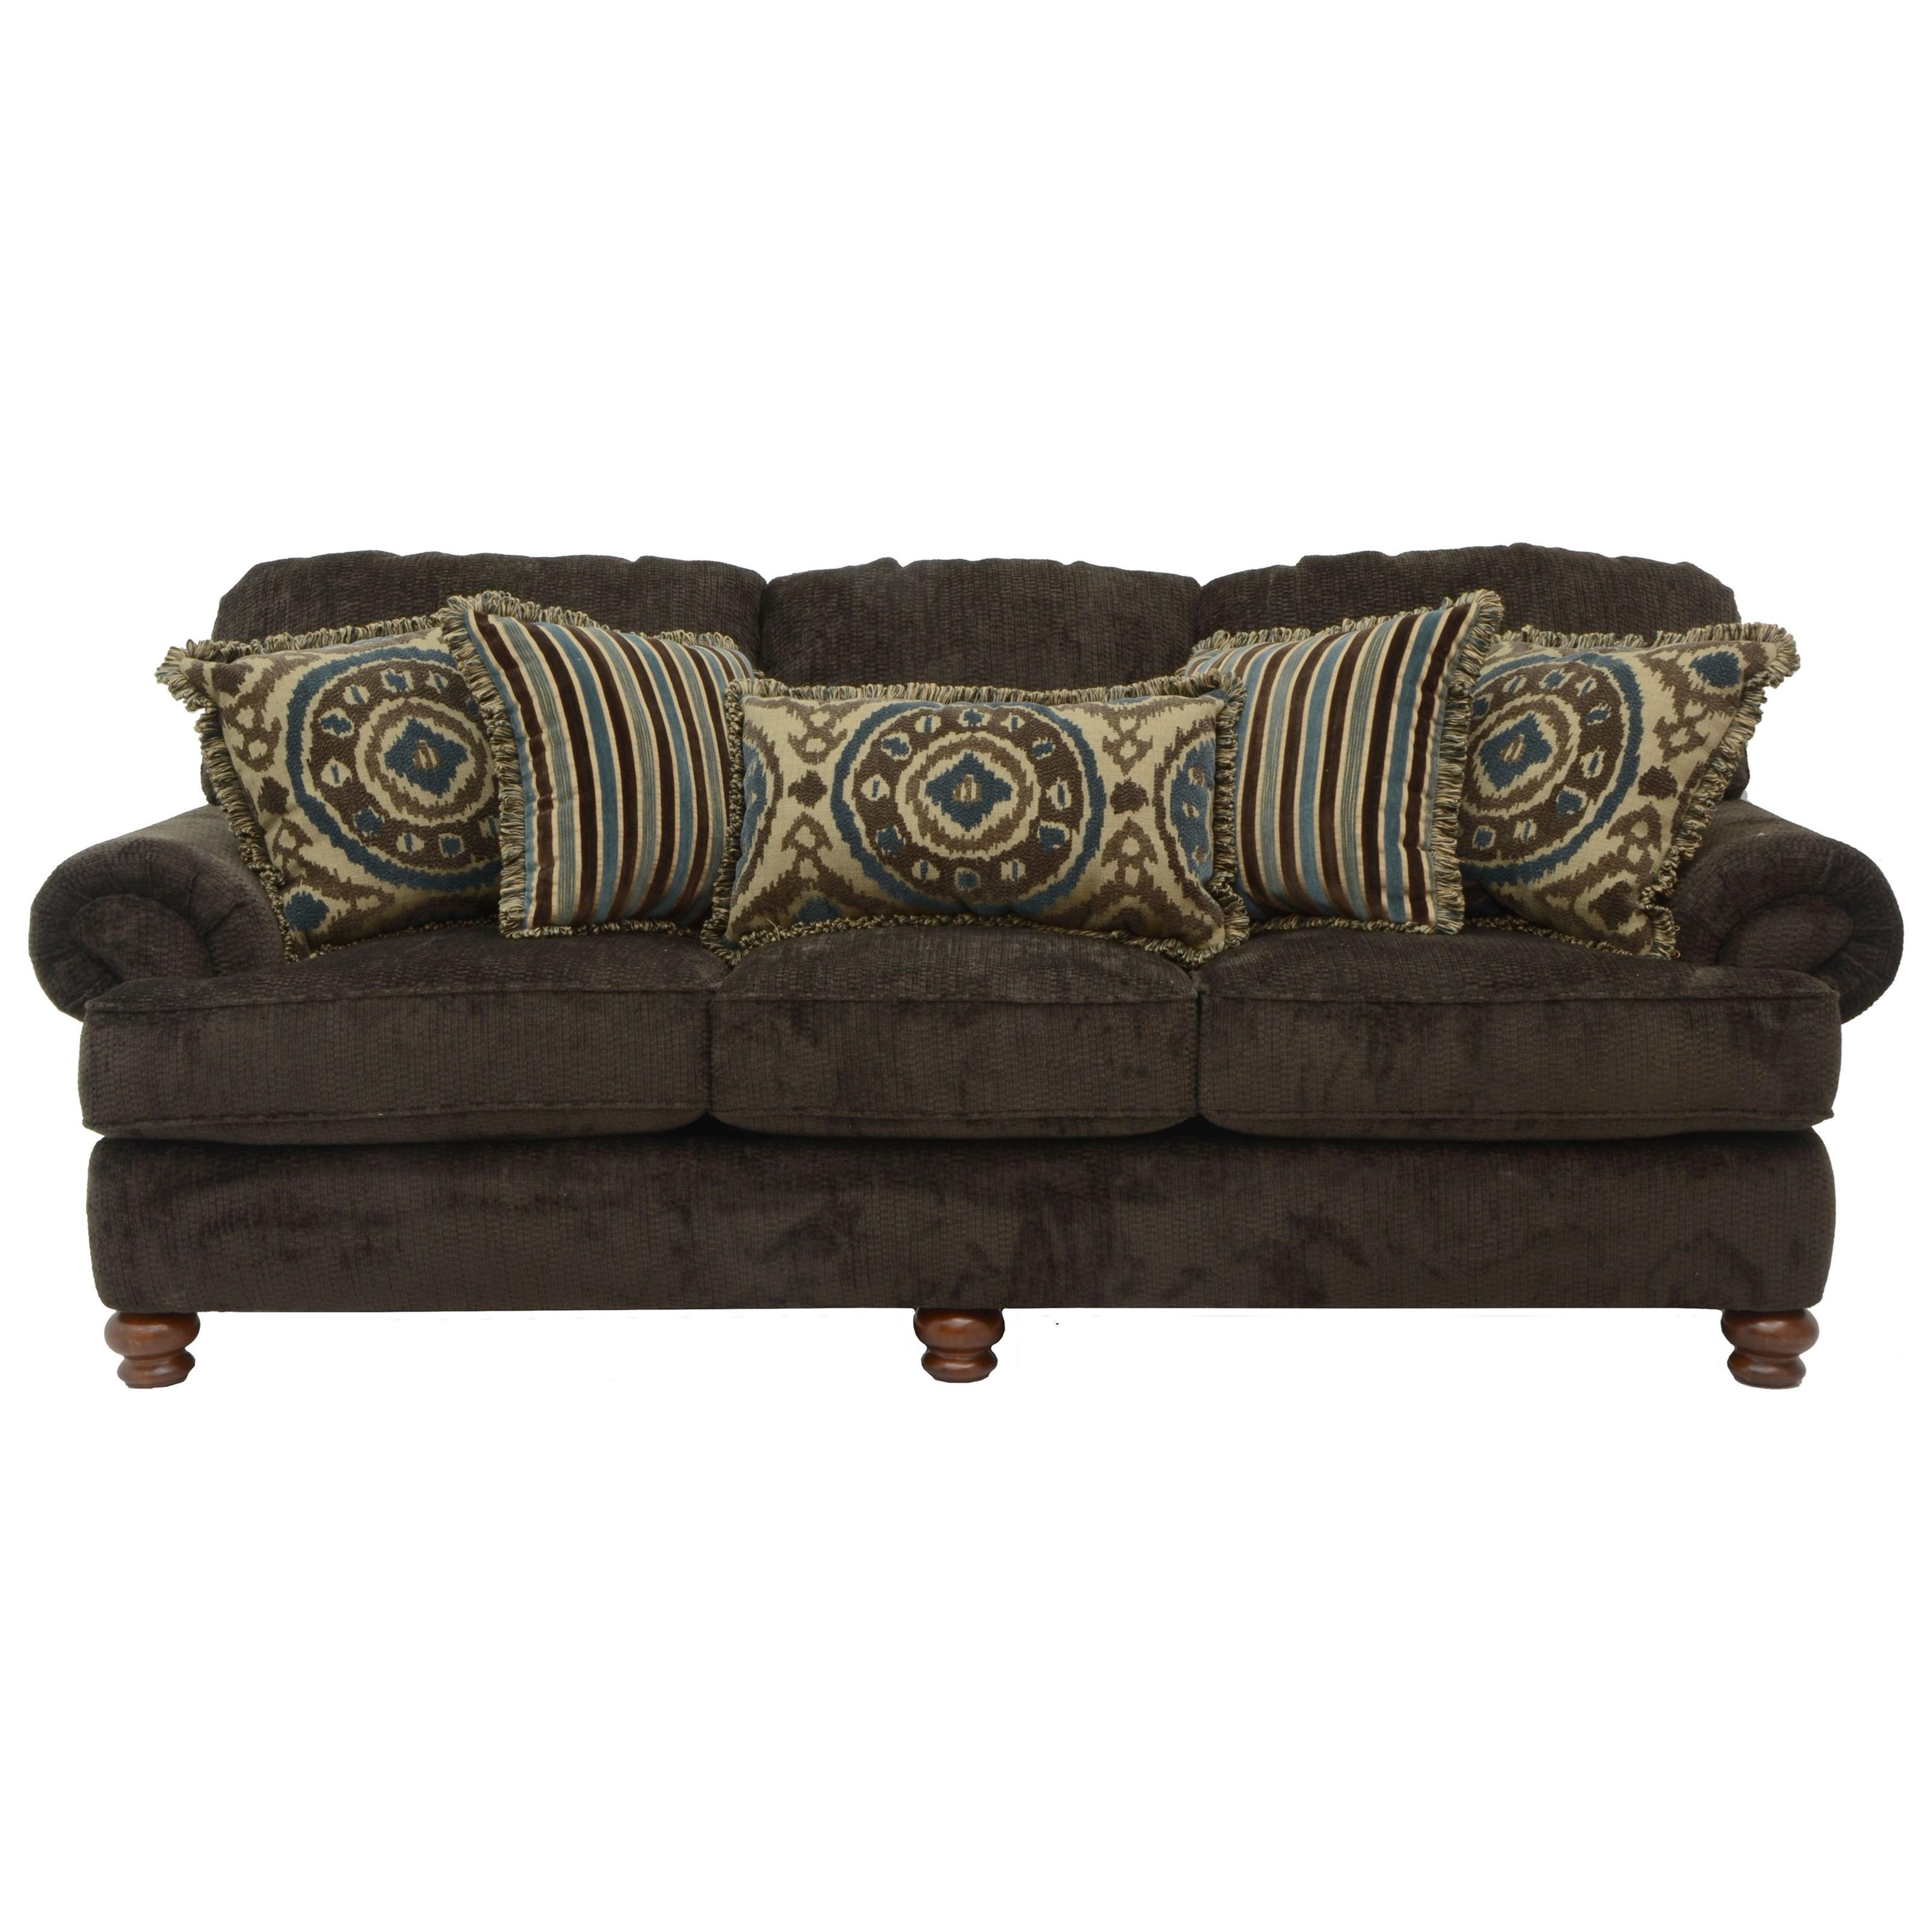 Jackson Furniture Belmont Sofa - Item Number: 4347-03-Belmont-Mahogany